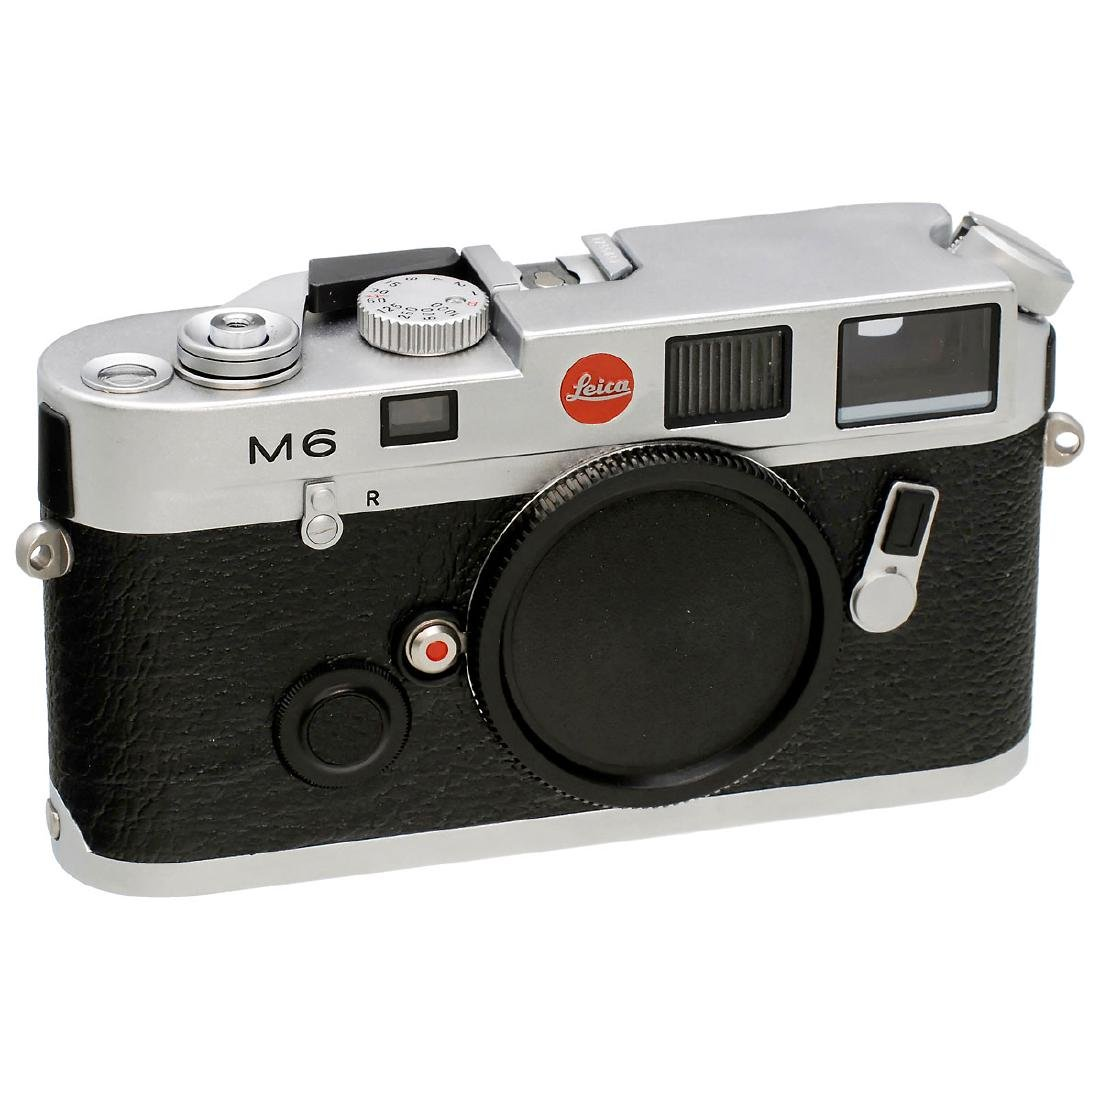 Leica M6 (Silver-Chrome Finish), 1988